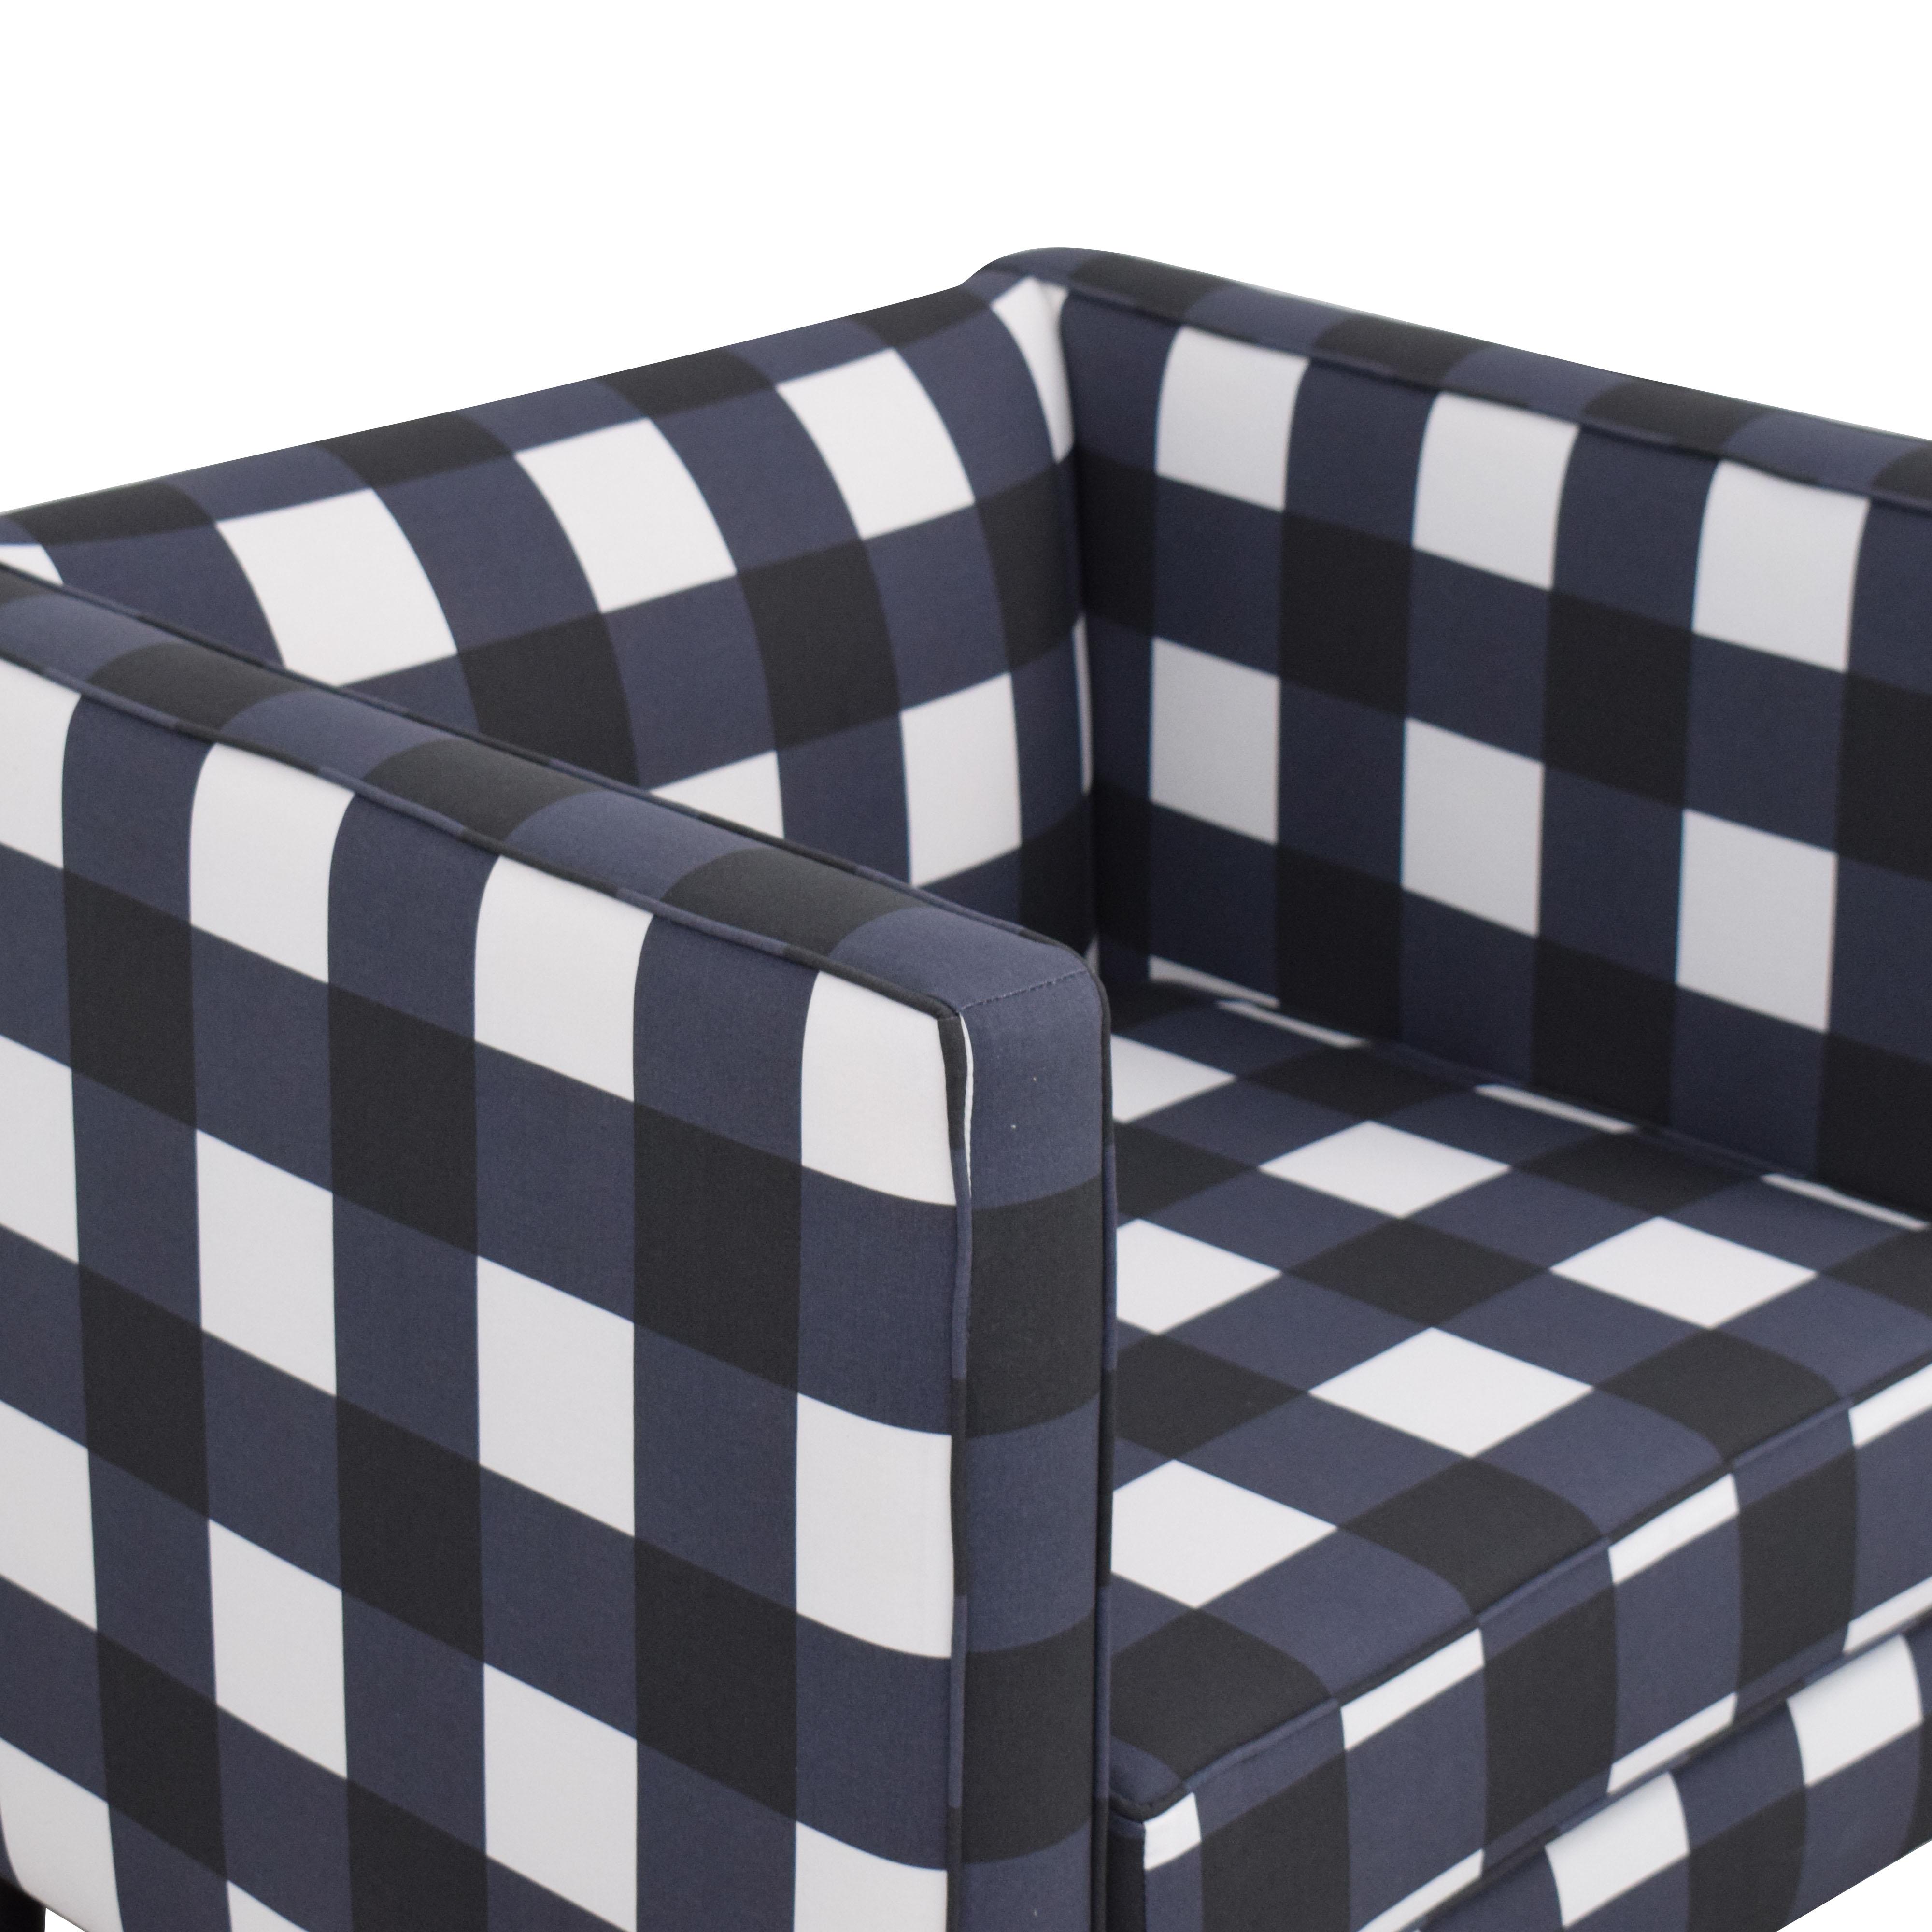 The Inside The Inside Tuxedo Chair price